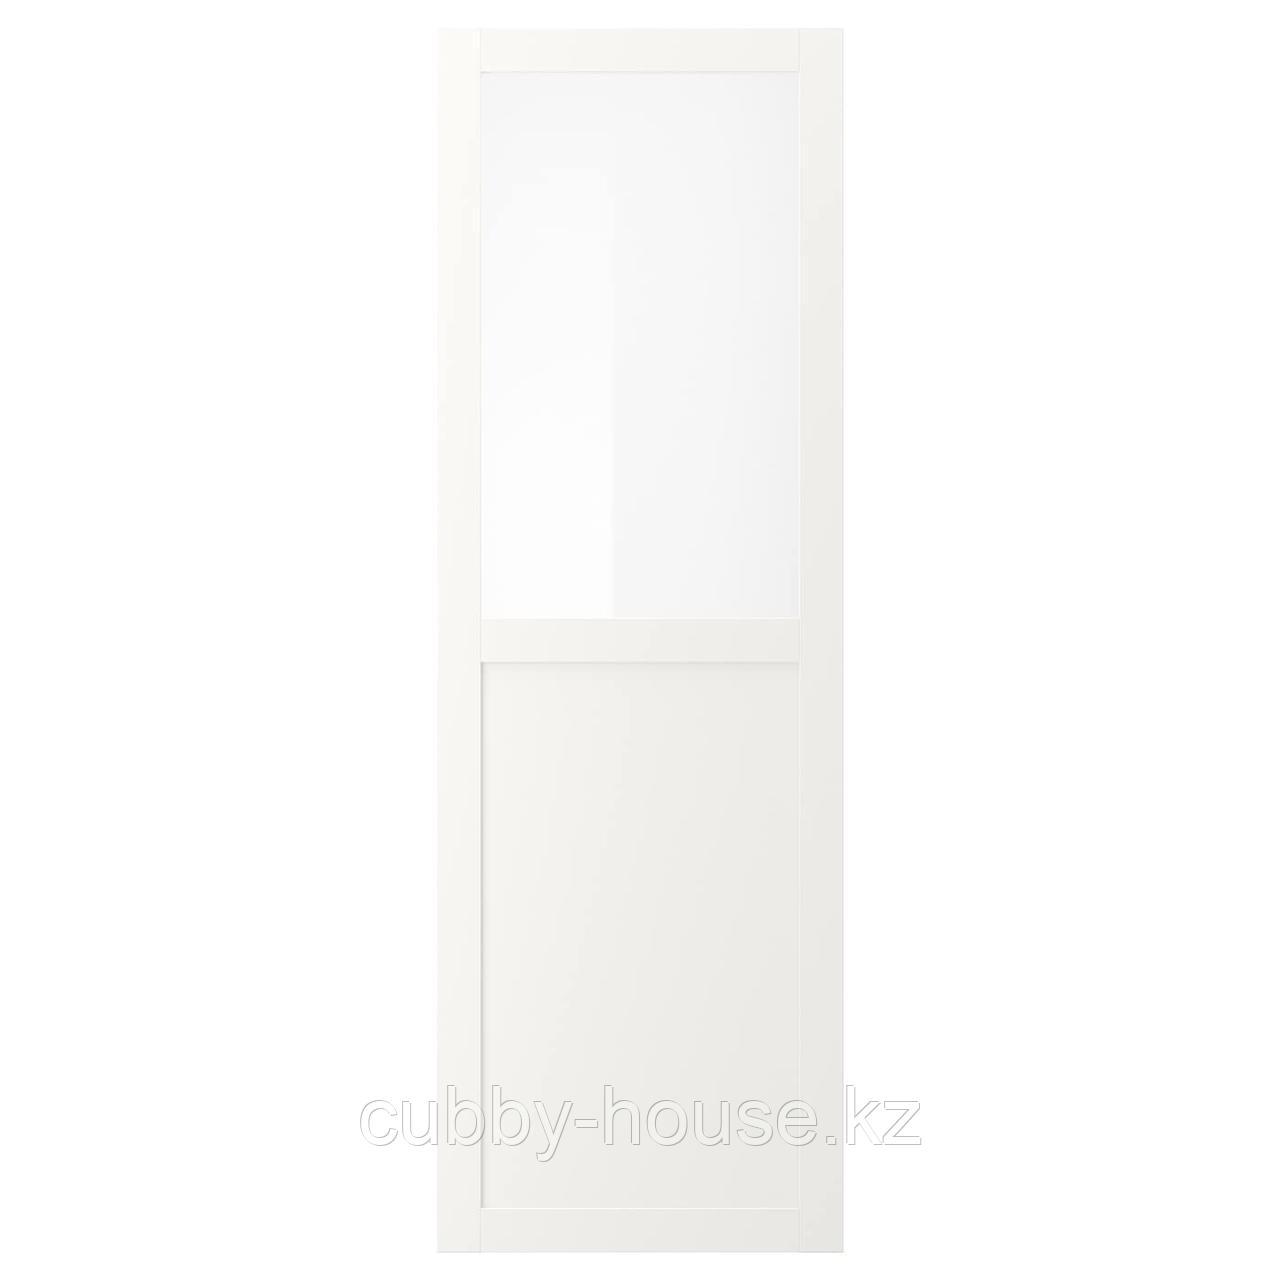 ВЭРД Панельн/стеклян дверца, белый, 60x180 см